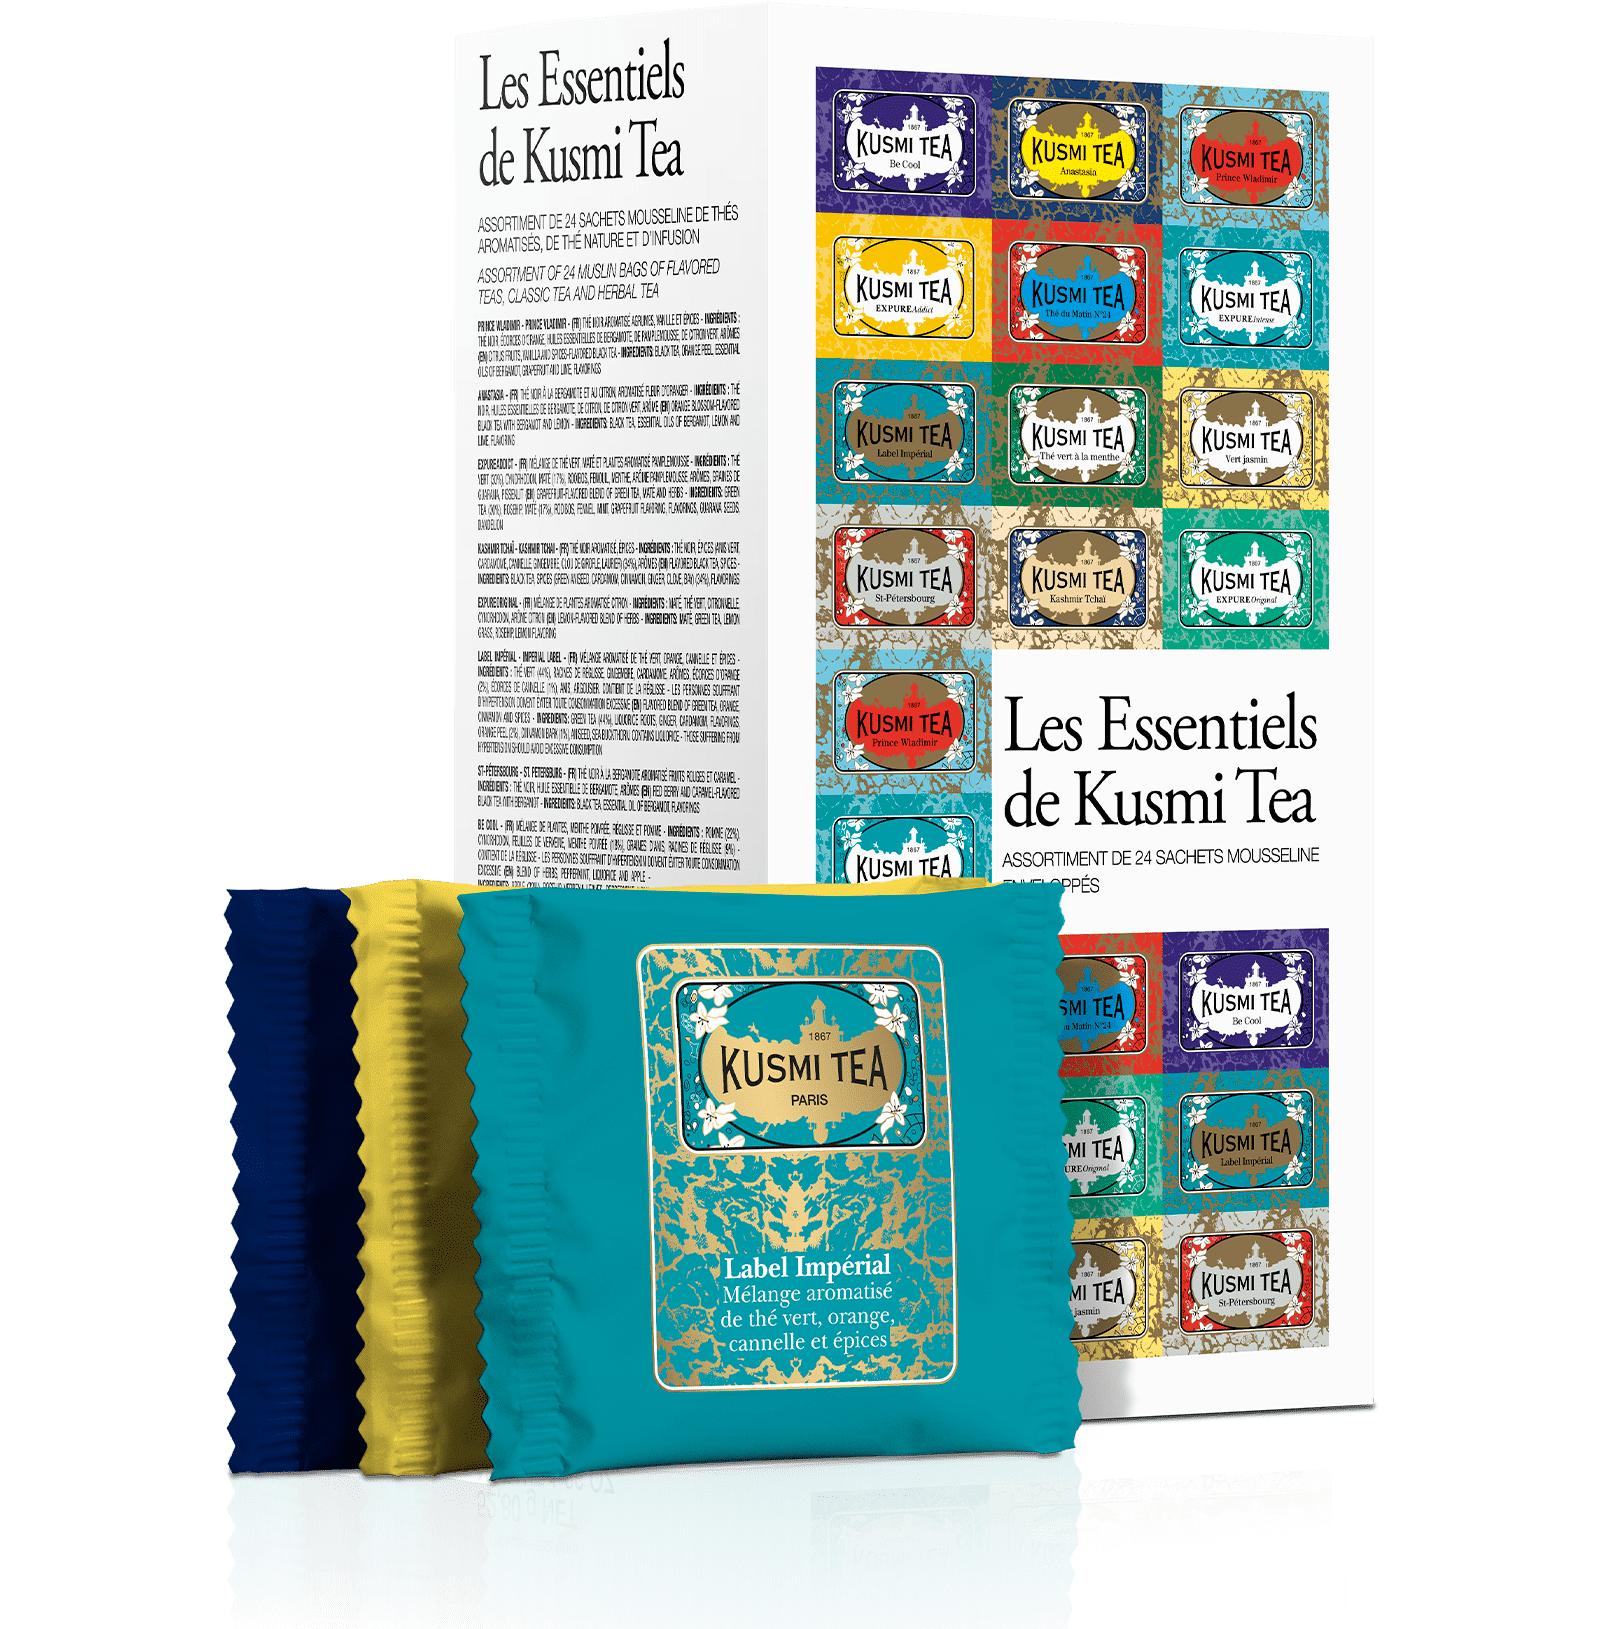 KUSMI TEA Coffret les Essentiels de 24 sachets de thé Kusmi Tea